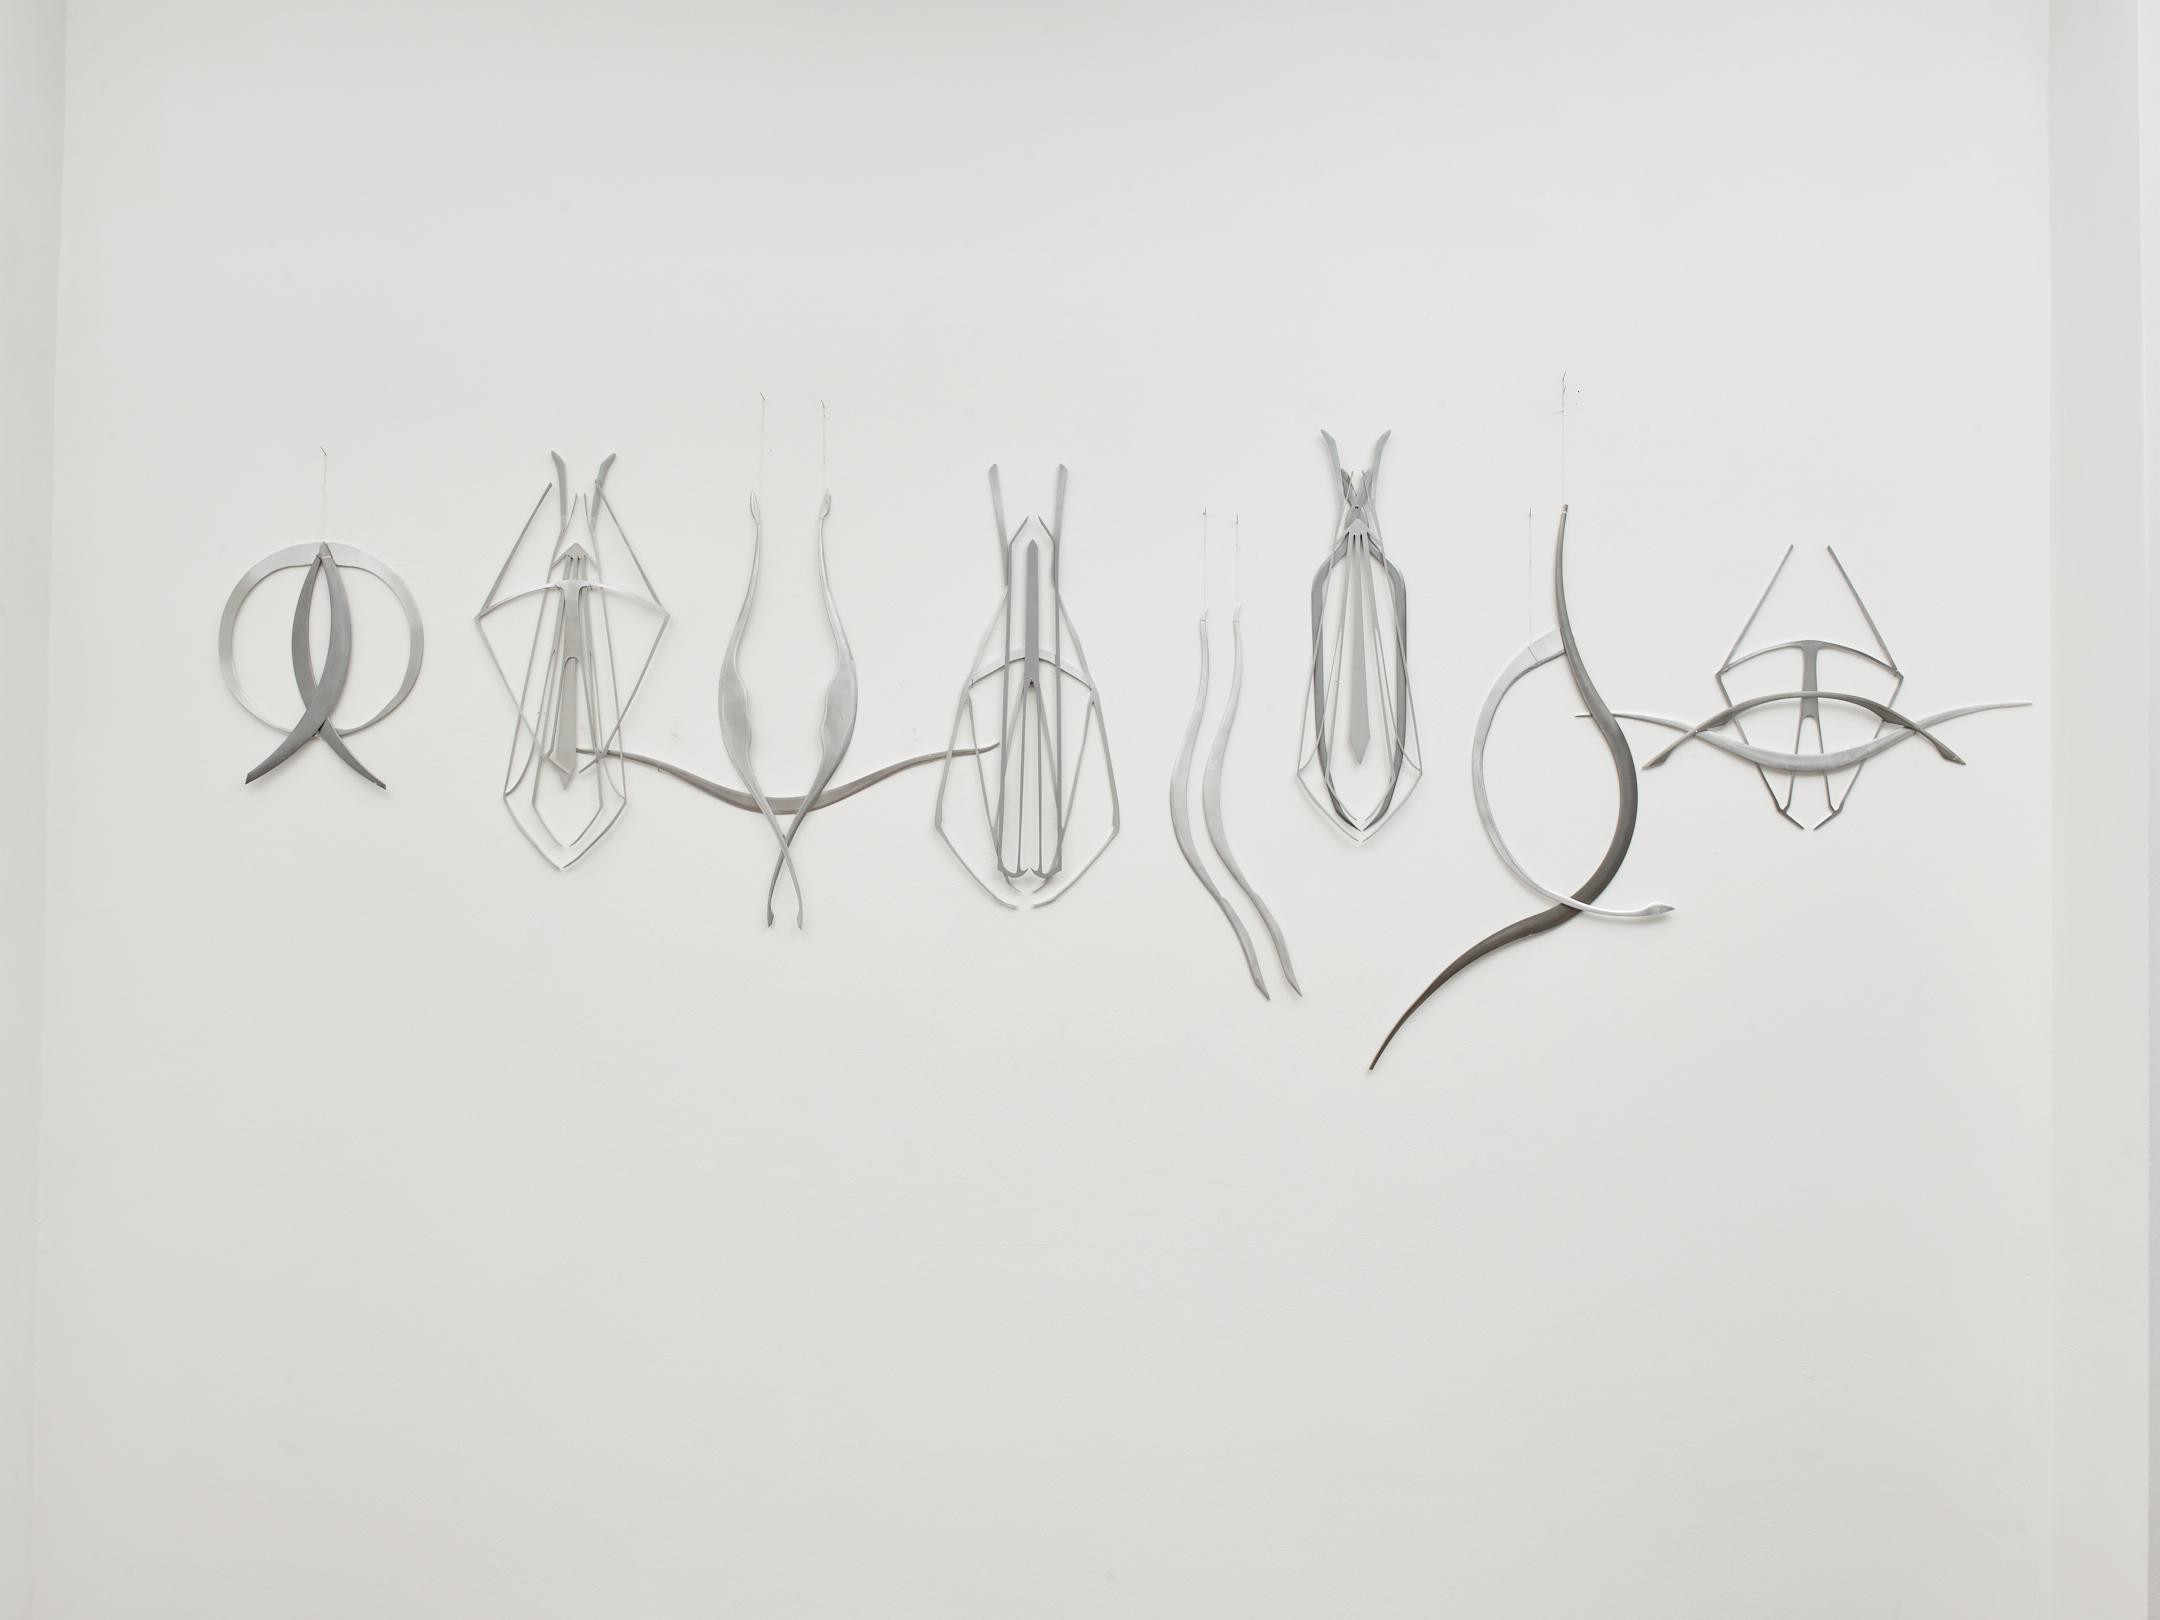 Miriam Austin  Solanum (Sequence for Pietroassa) , 2018 Aluminium, steel, wax, silk thread 270 x 45 x 2.5 cm